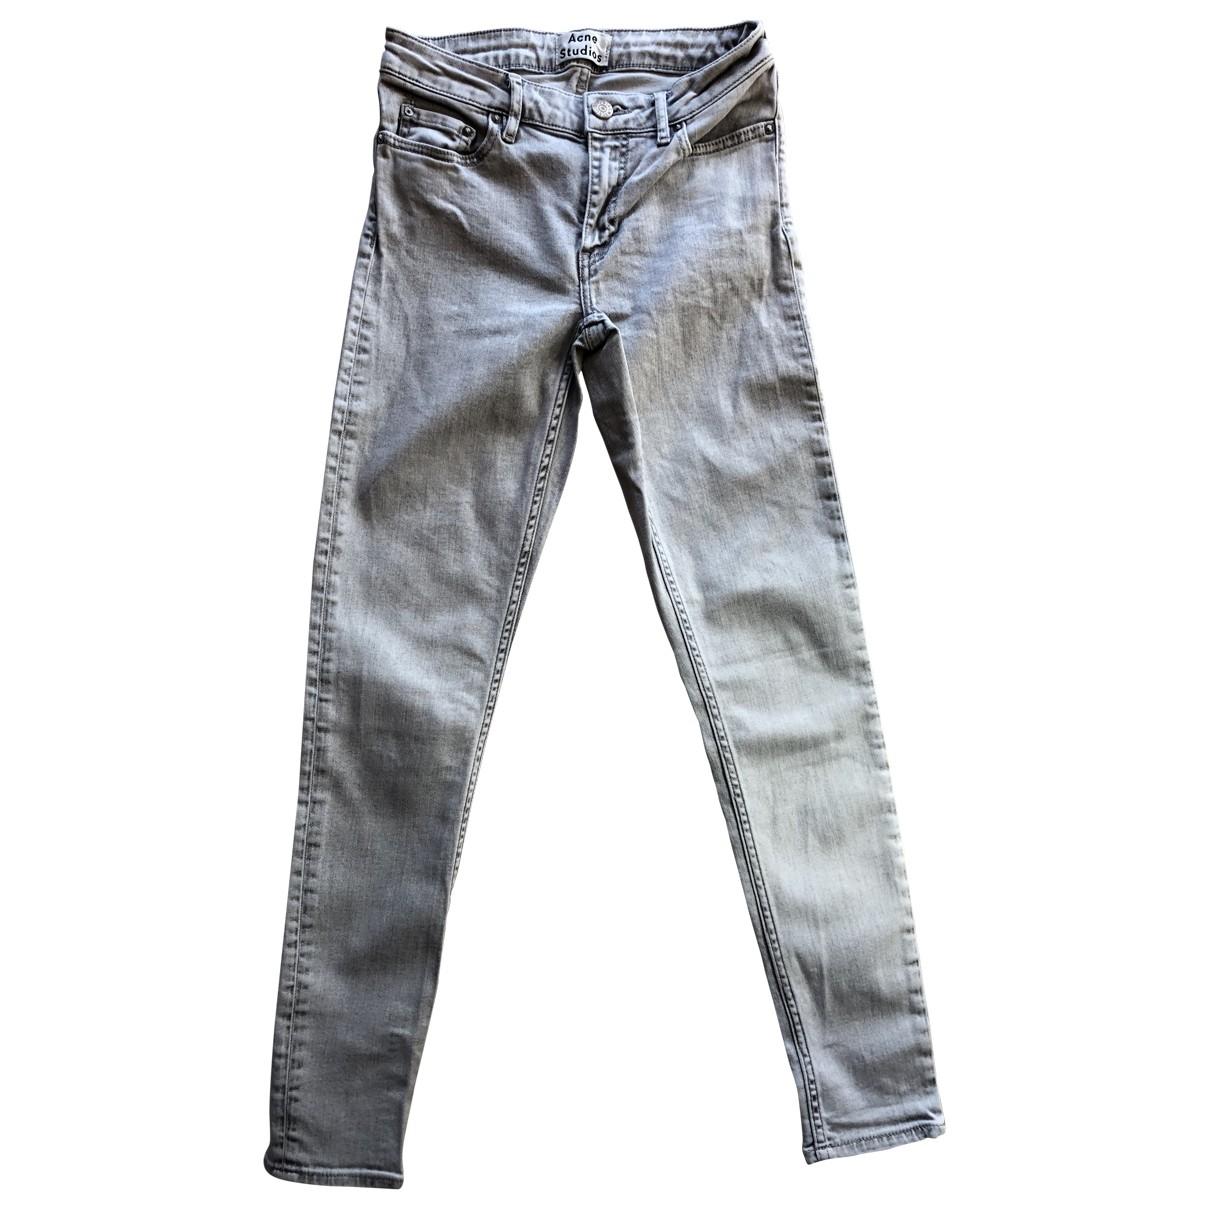 Acne Studios Skin 5 Grey Cotton Jeans for Women 26 US